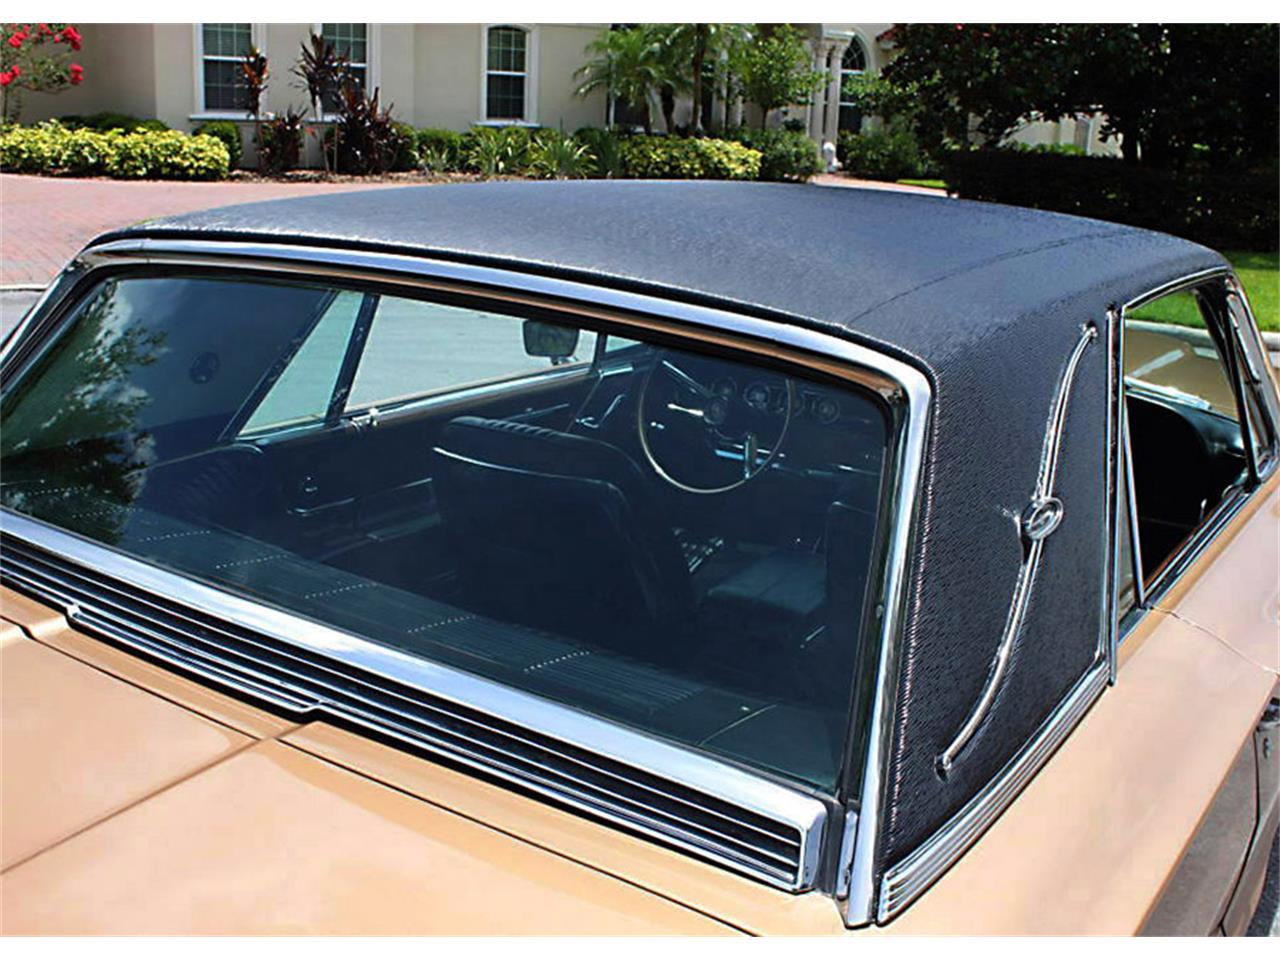 Large Picture of Classic 1964 Thunderbird located in Lakeland Florida - $24,500.00 - NOG5